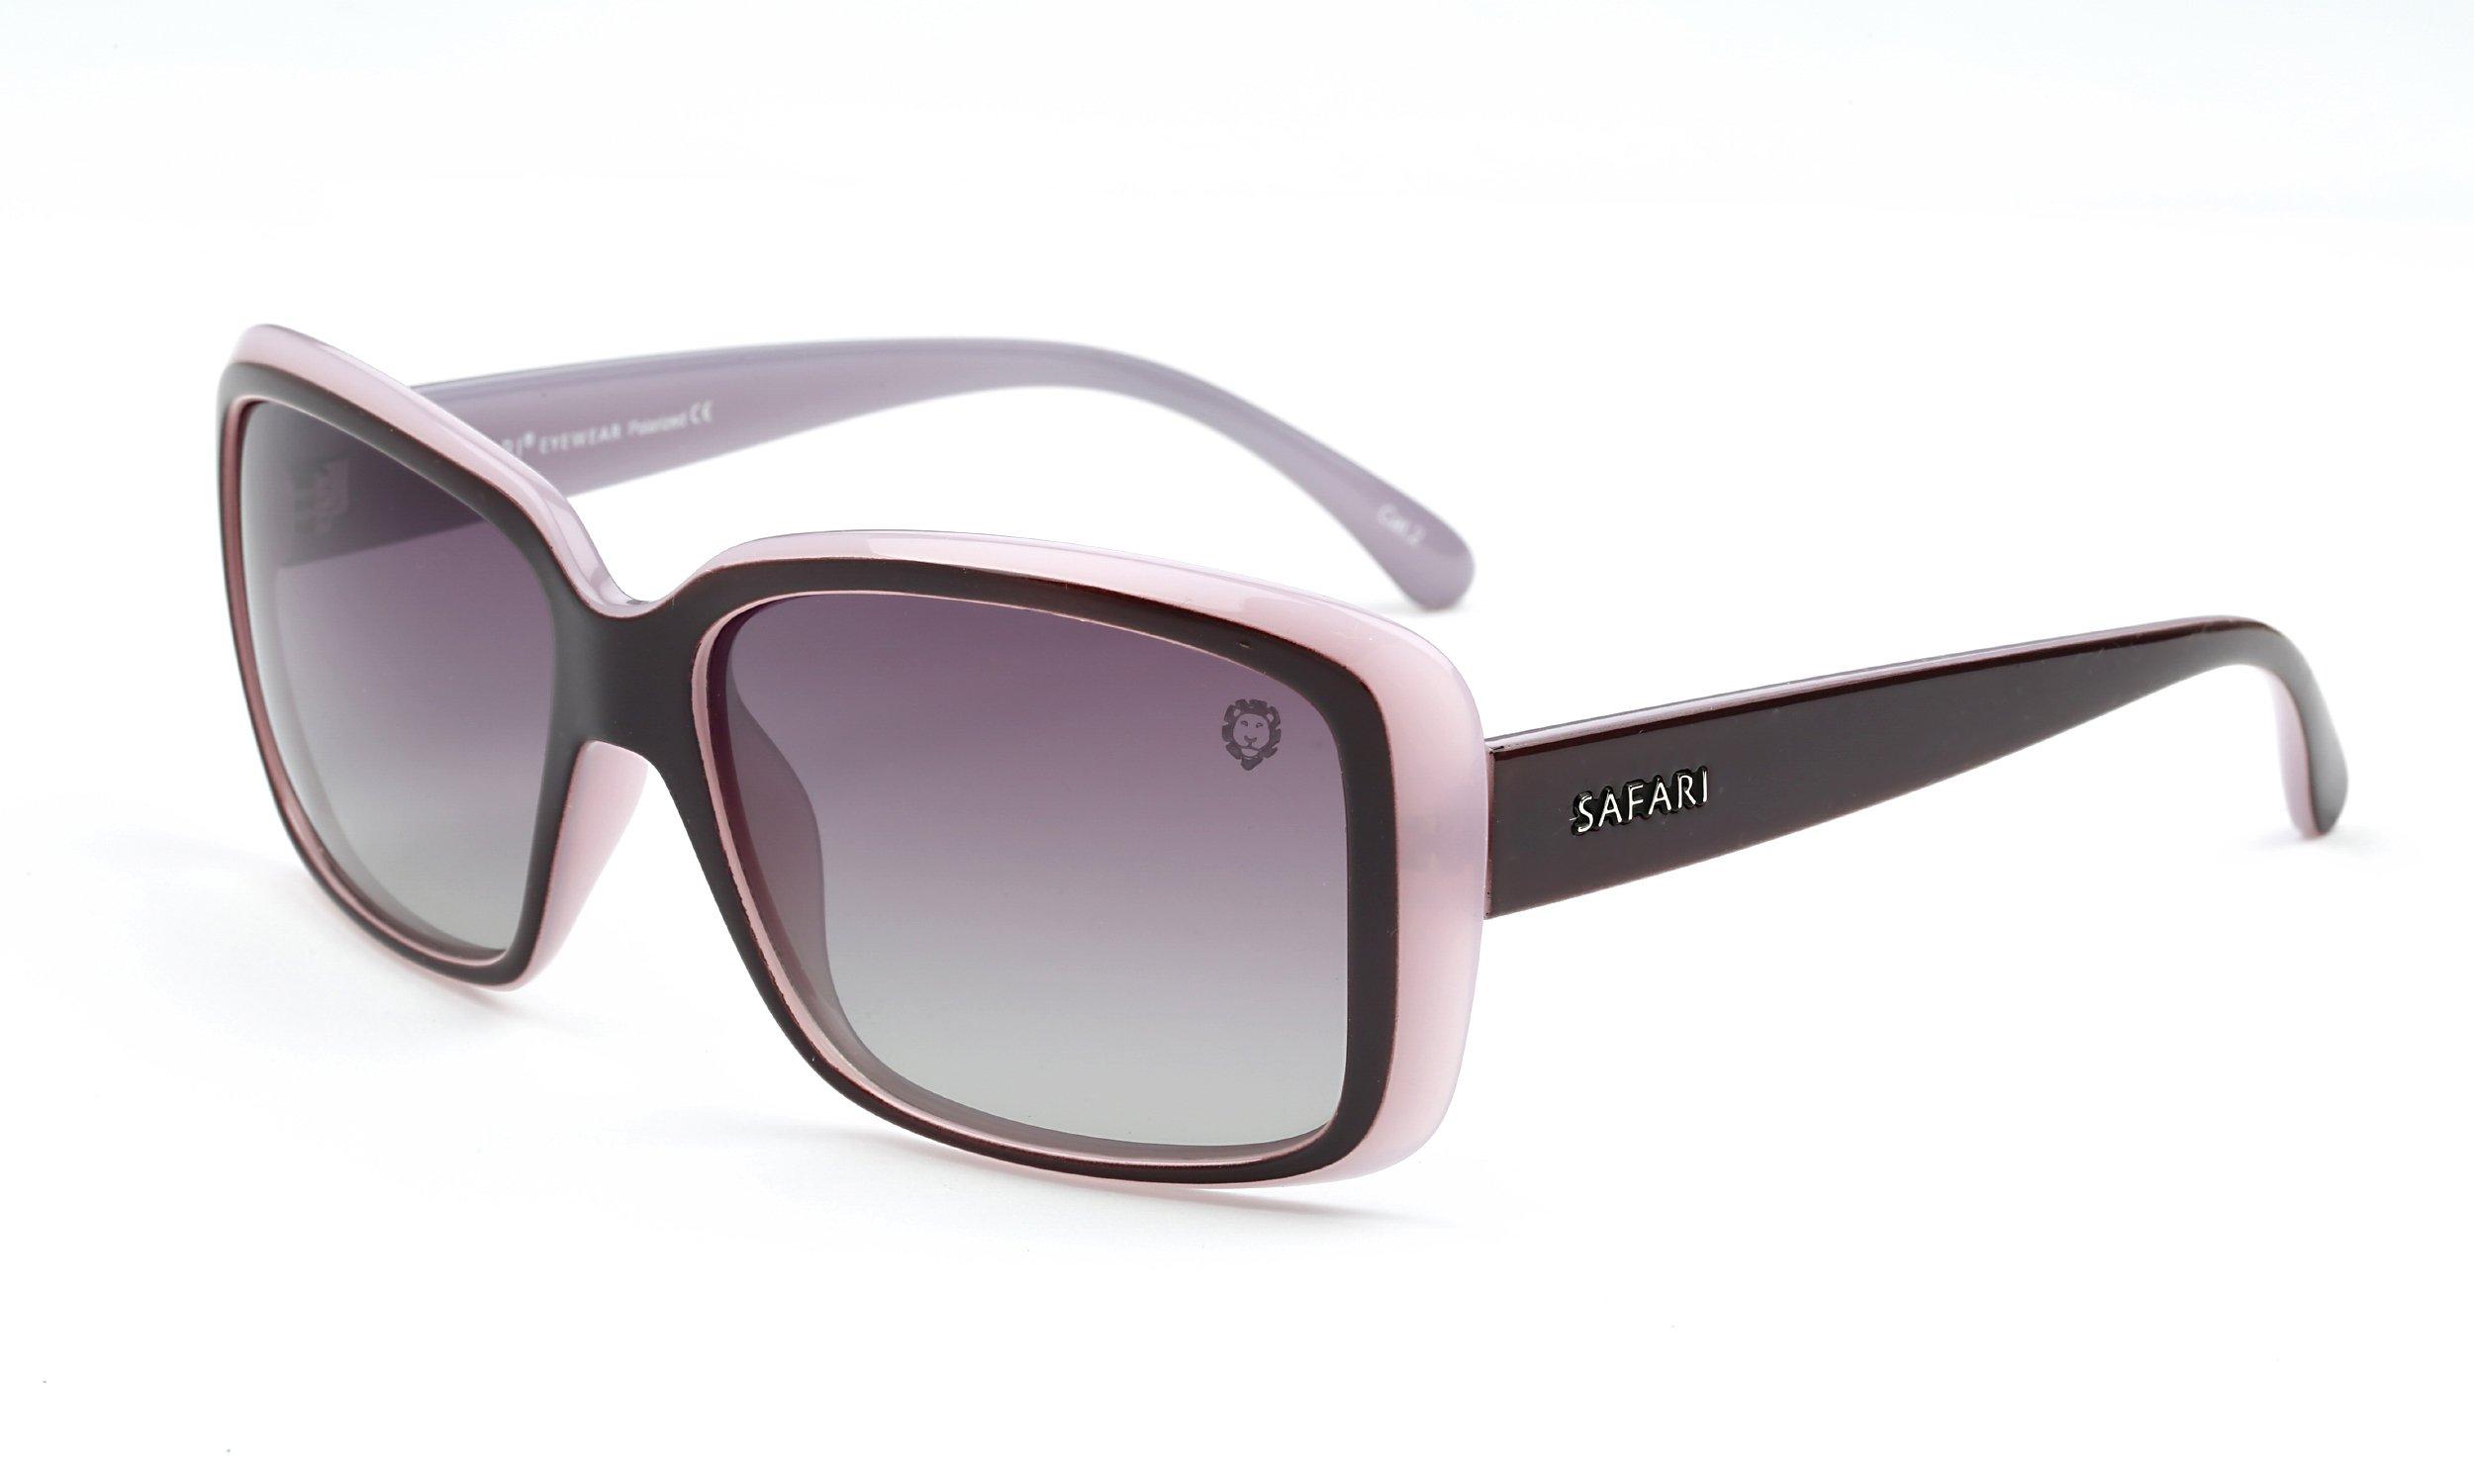 Polarized Sunglasses Aviator for Women by SAFARI Eyewear - LP10305PP